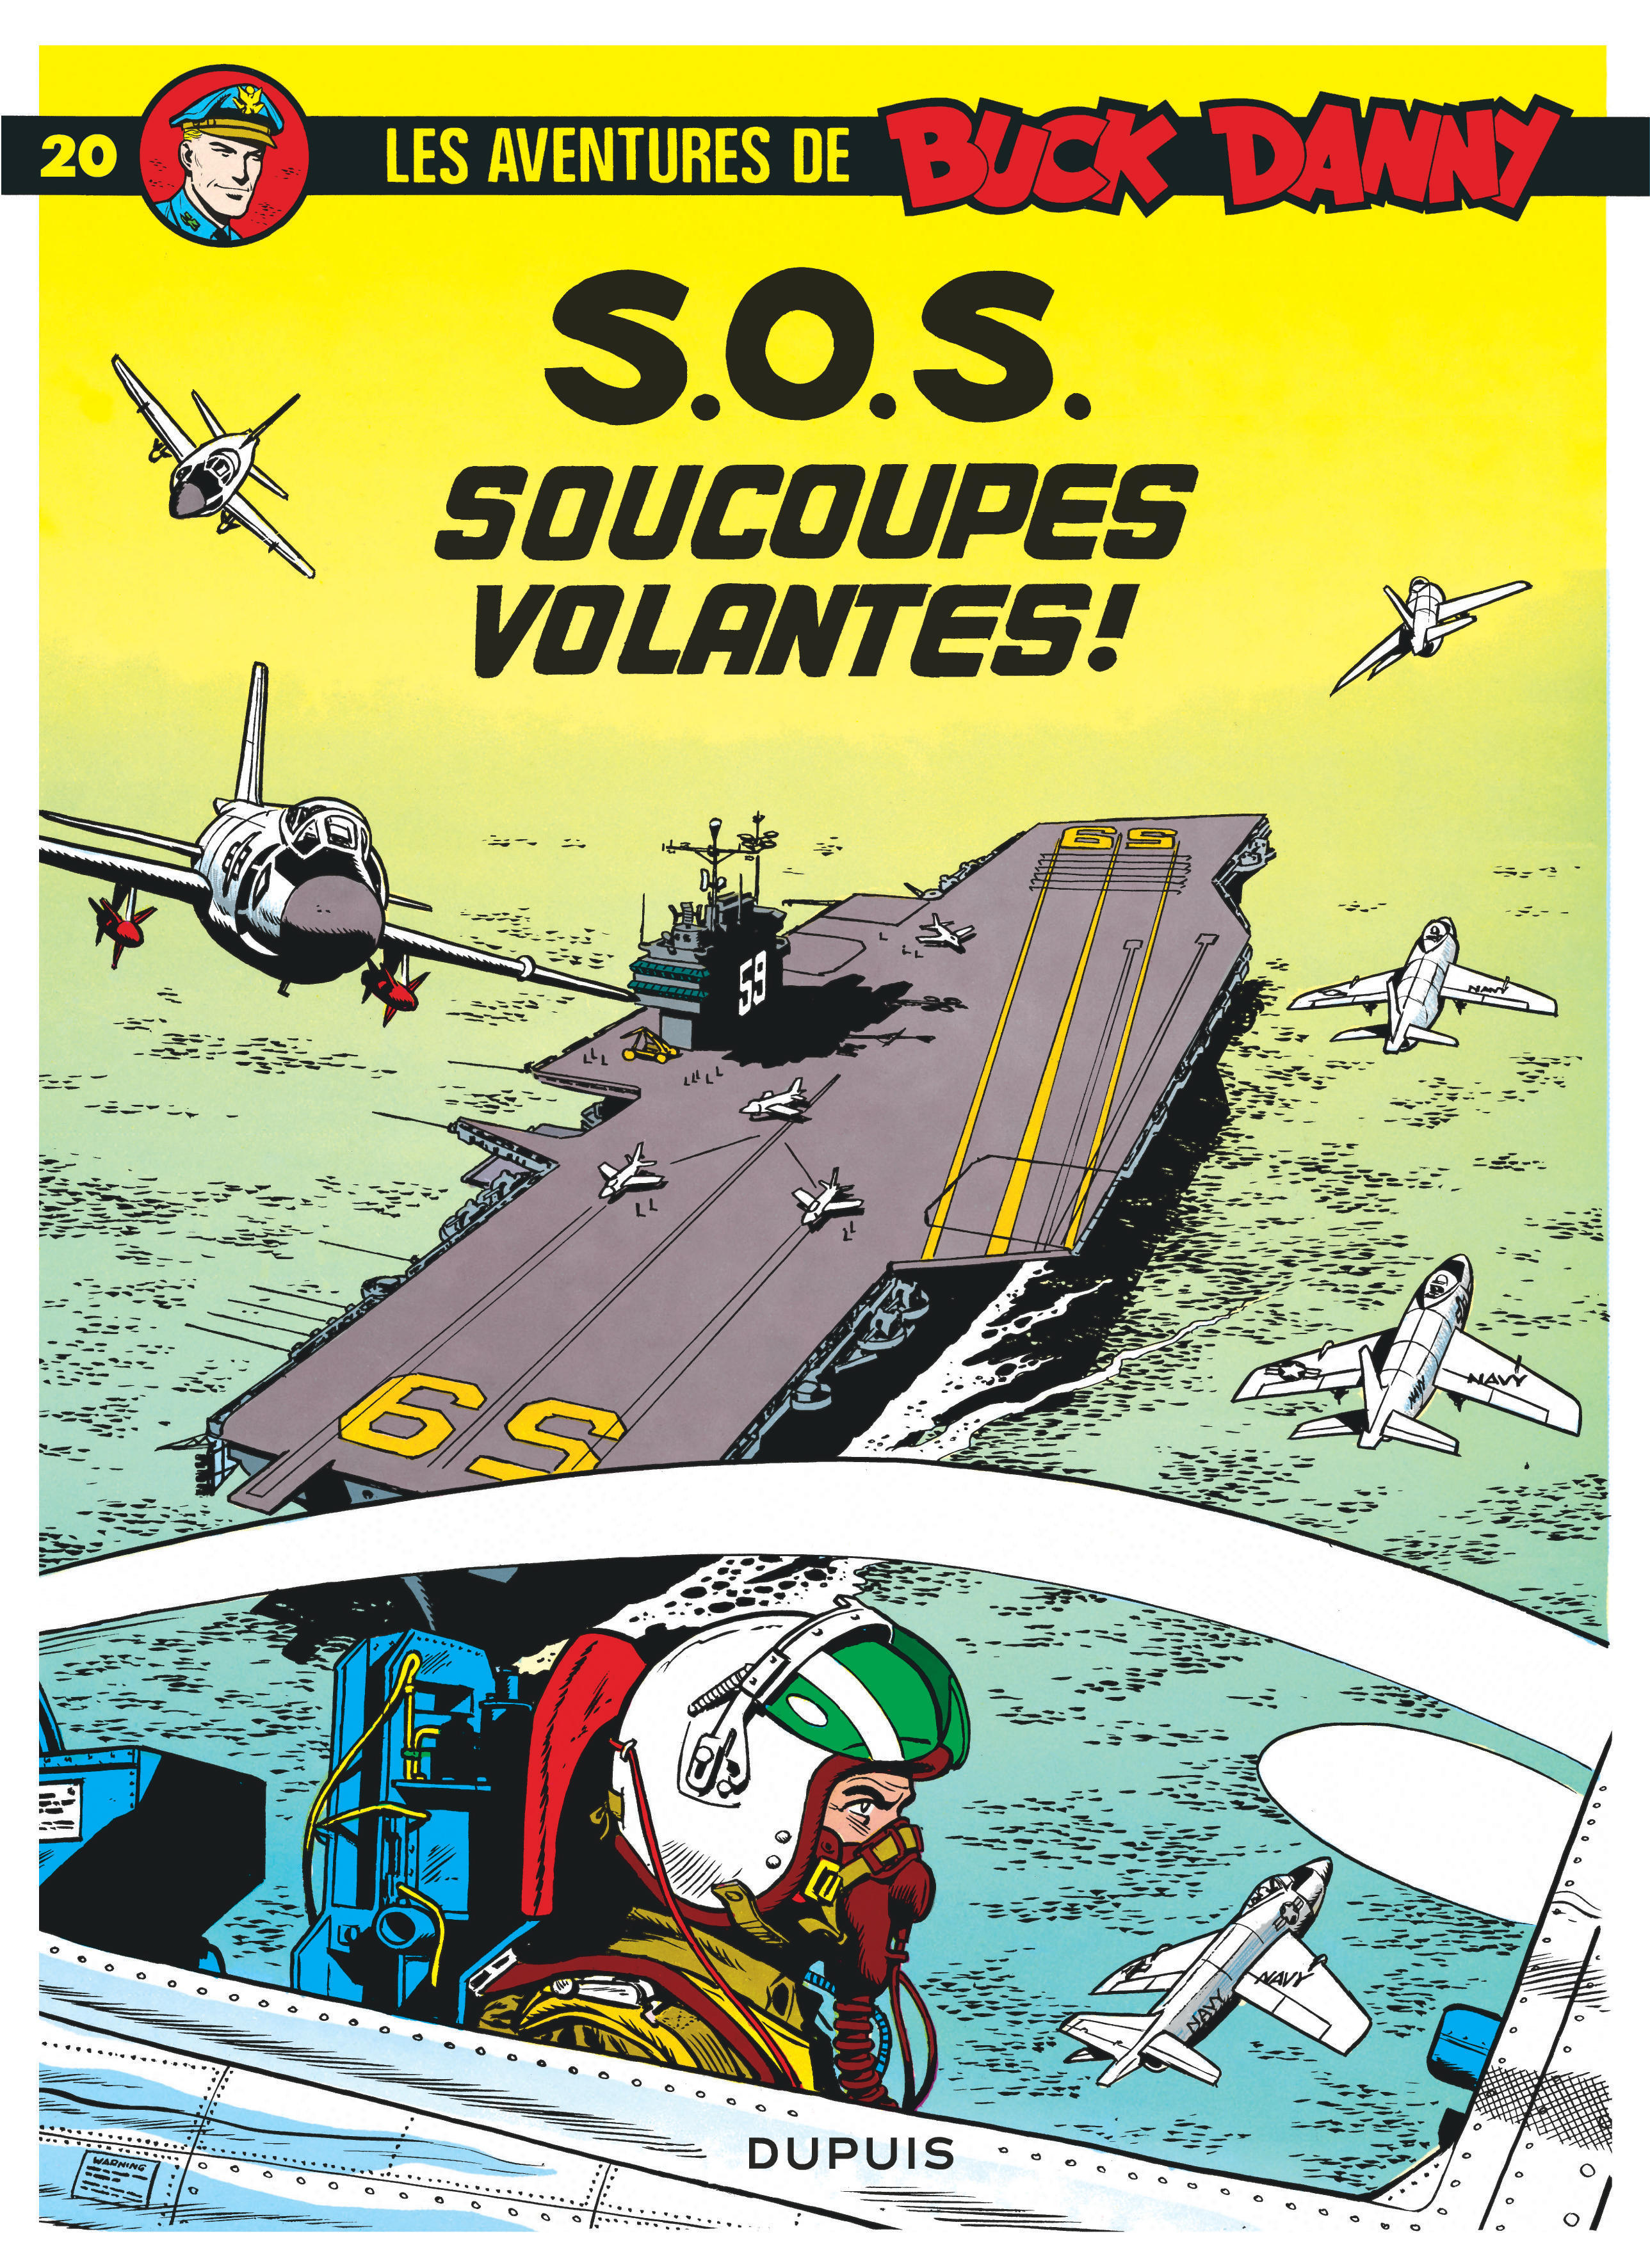 S.O.S.SOUCOUPES VOLANTES